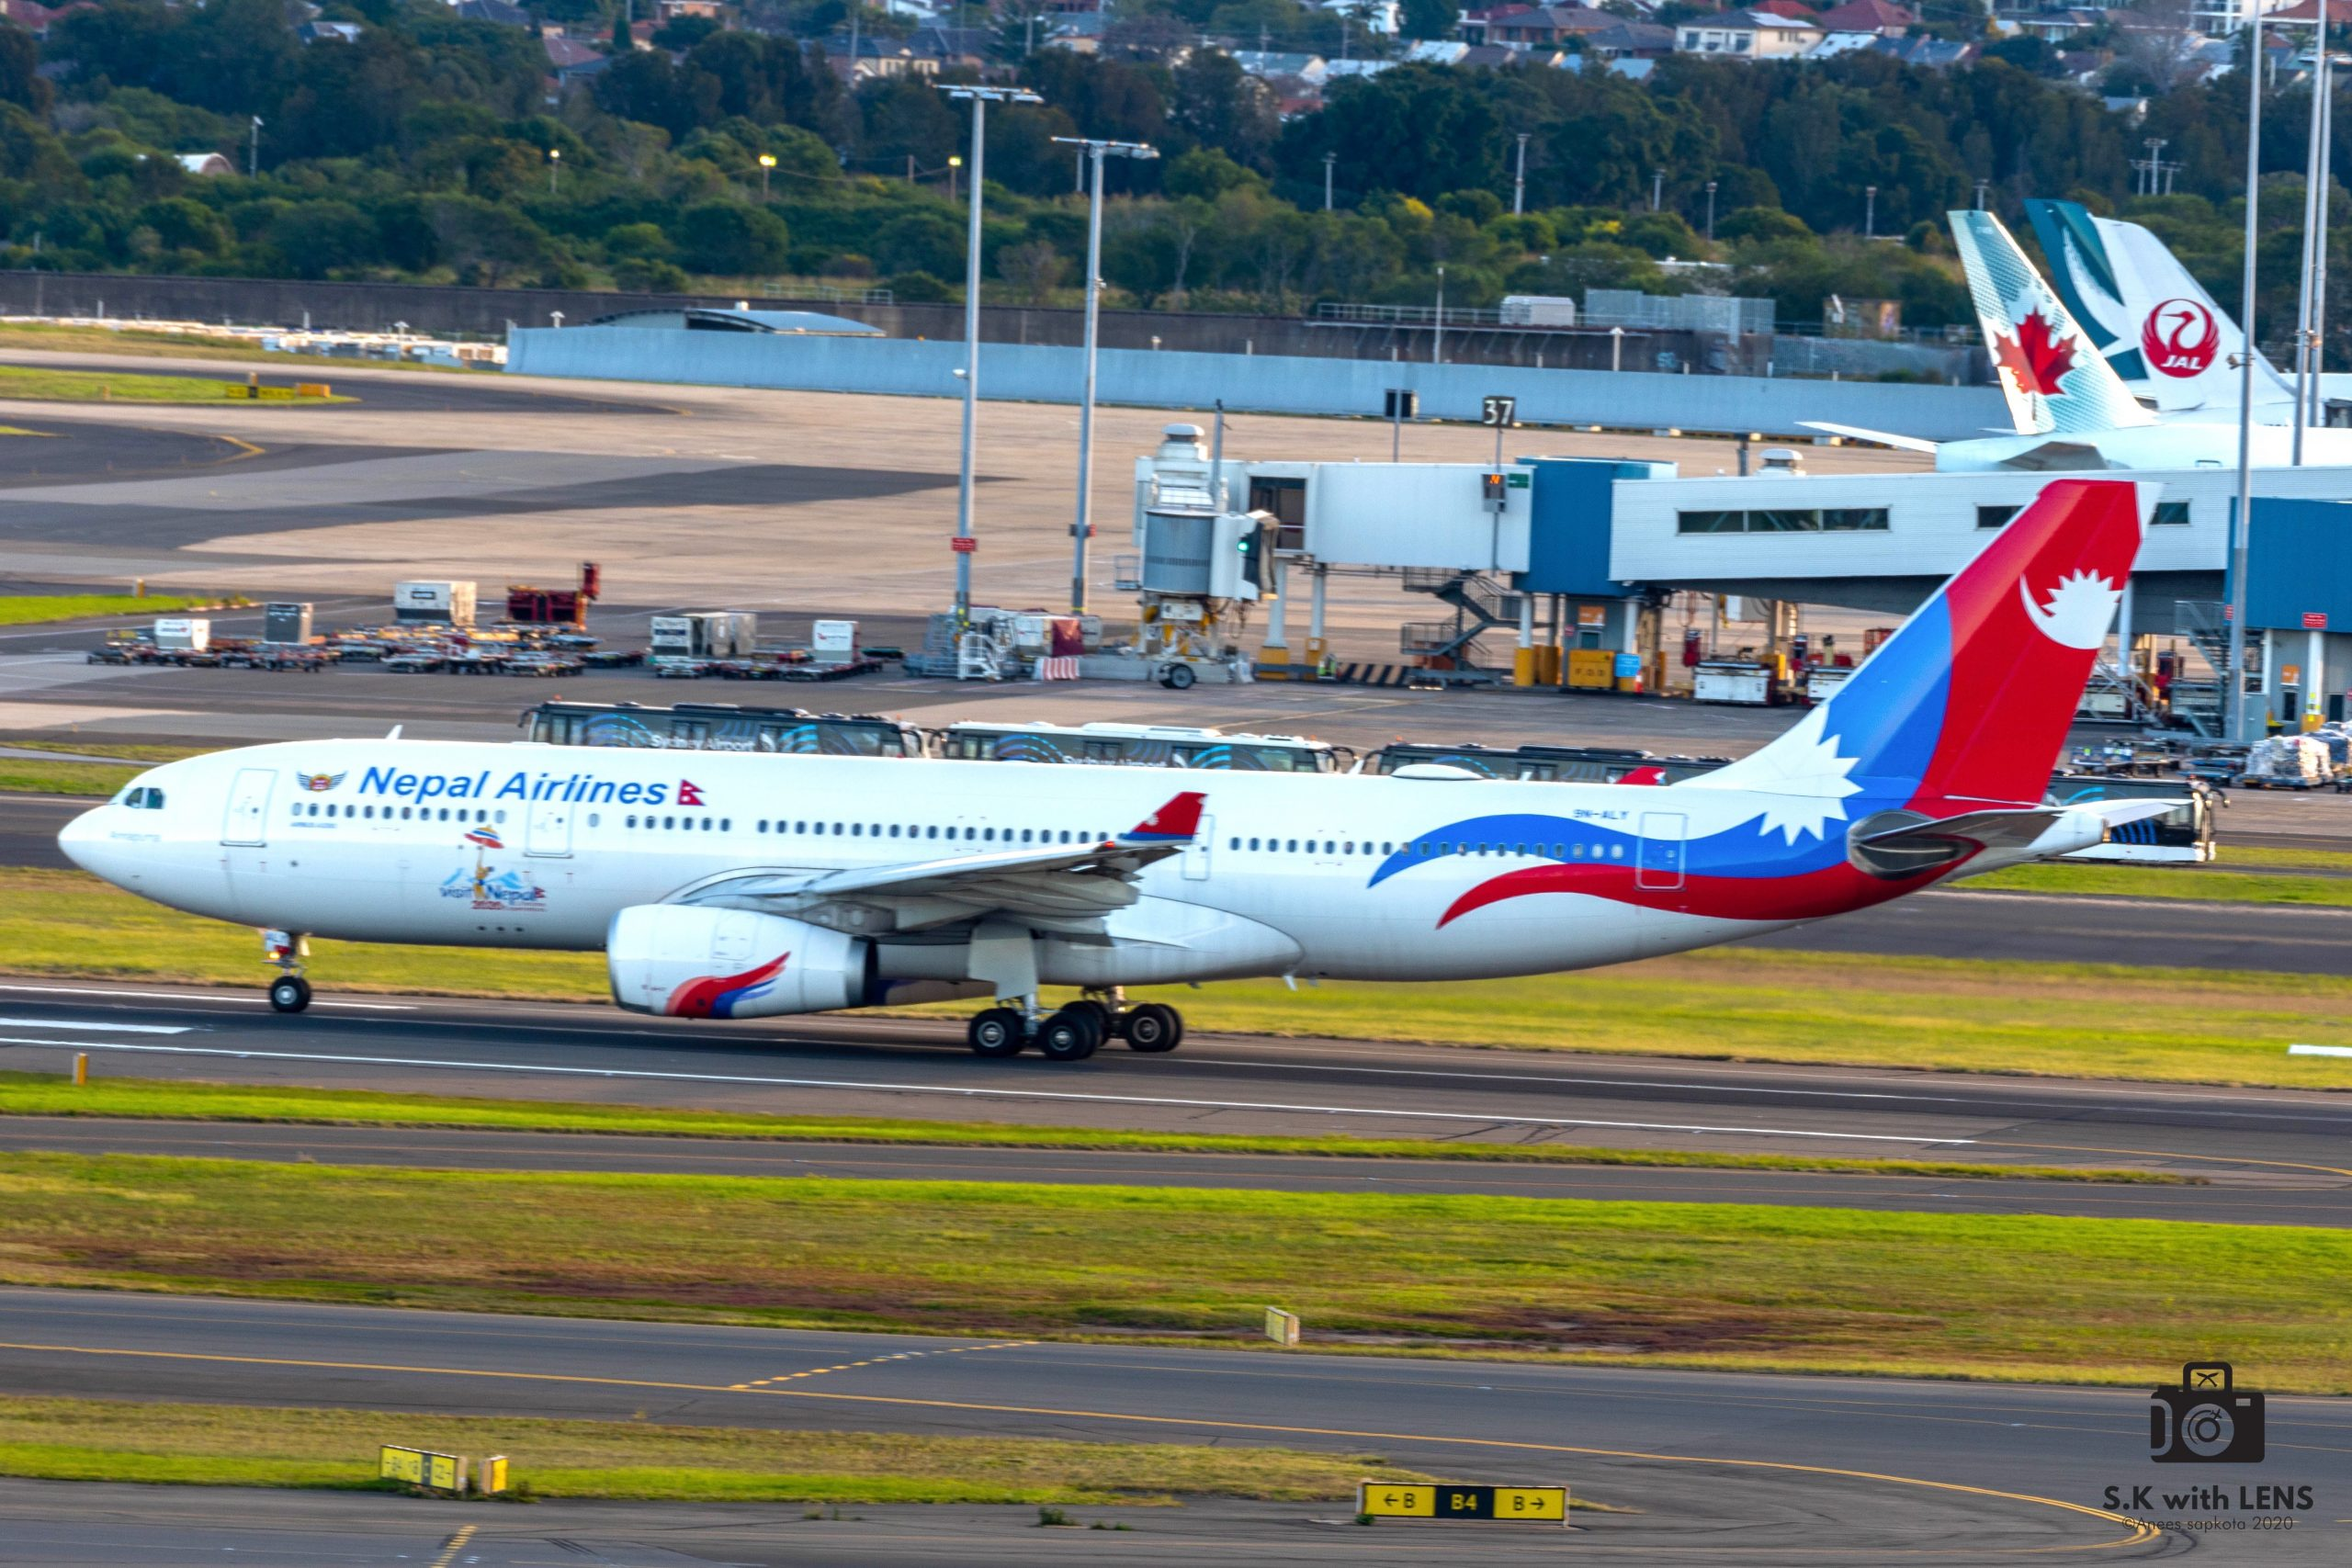 The Nepal Airlines repatriation flight from Sydney to Kathmandu